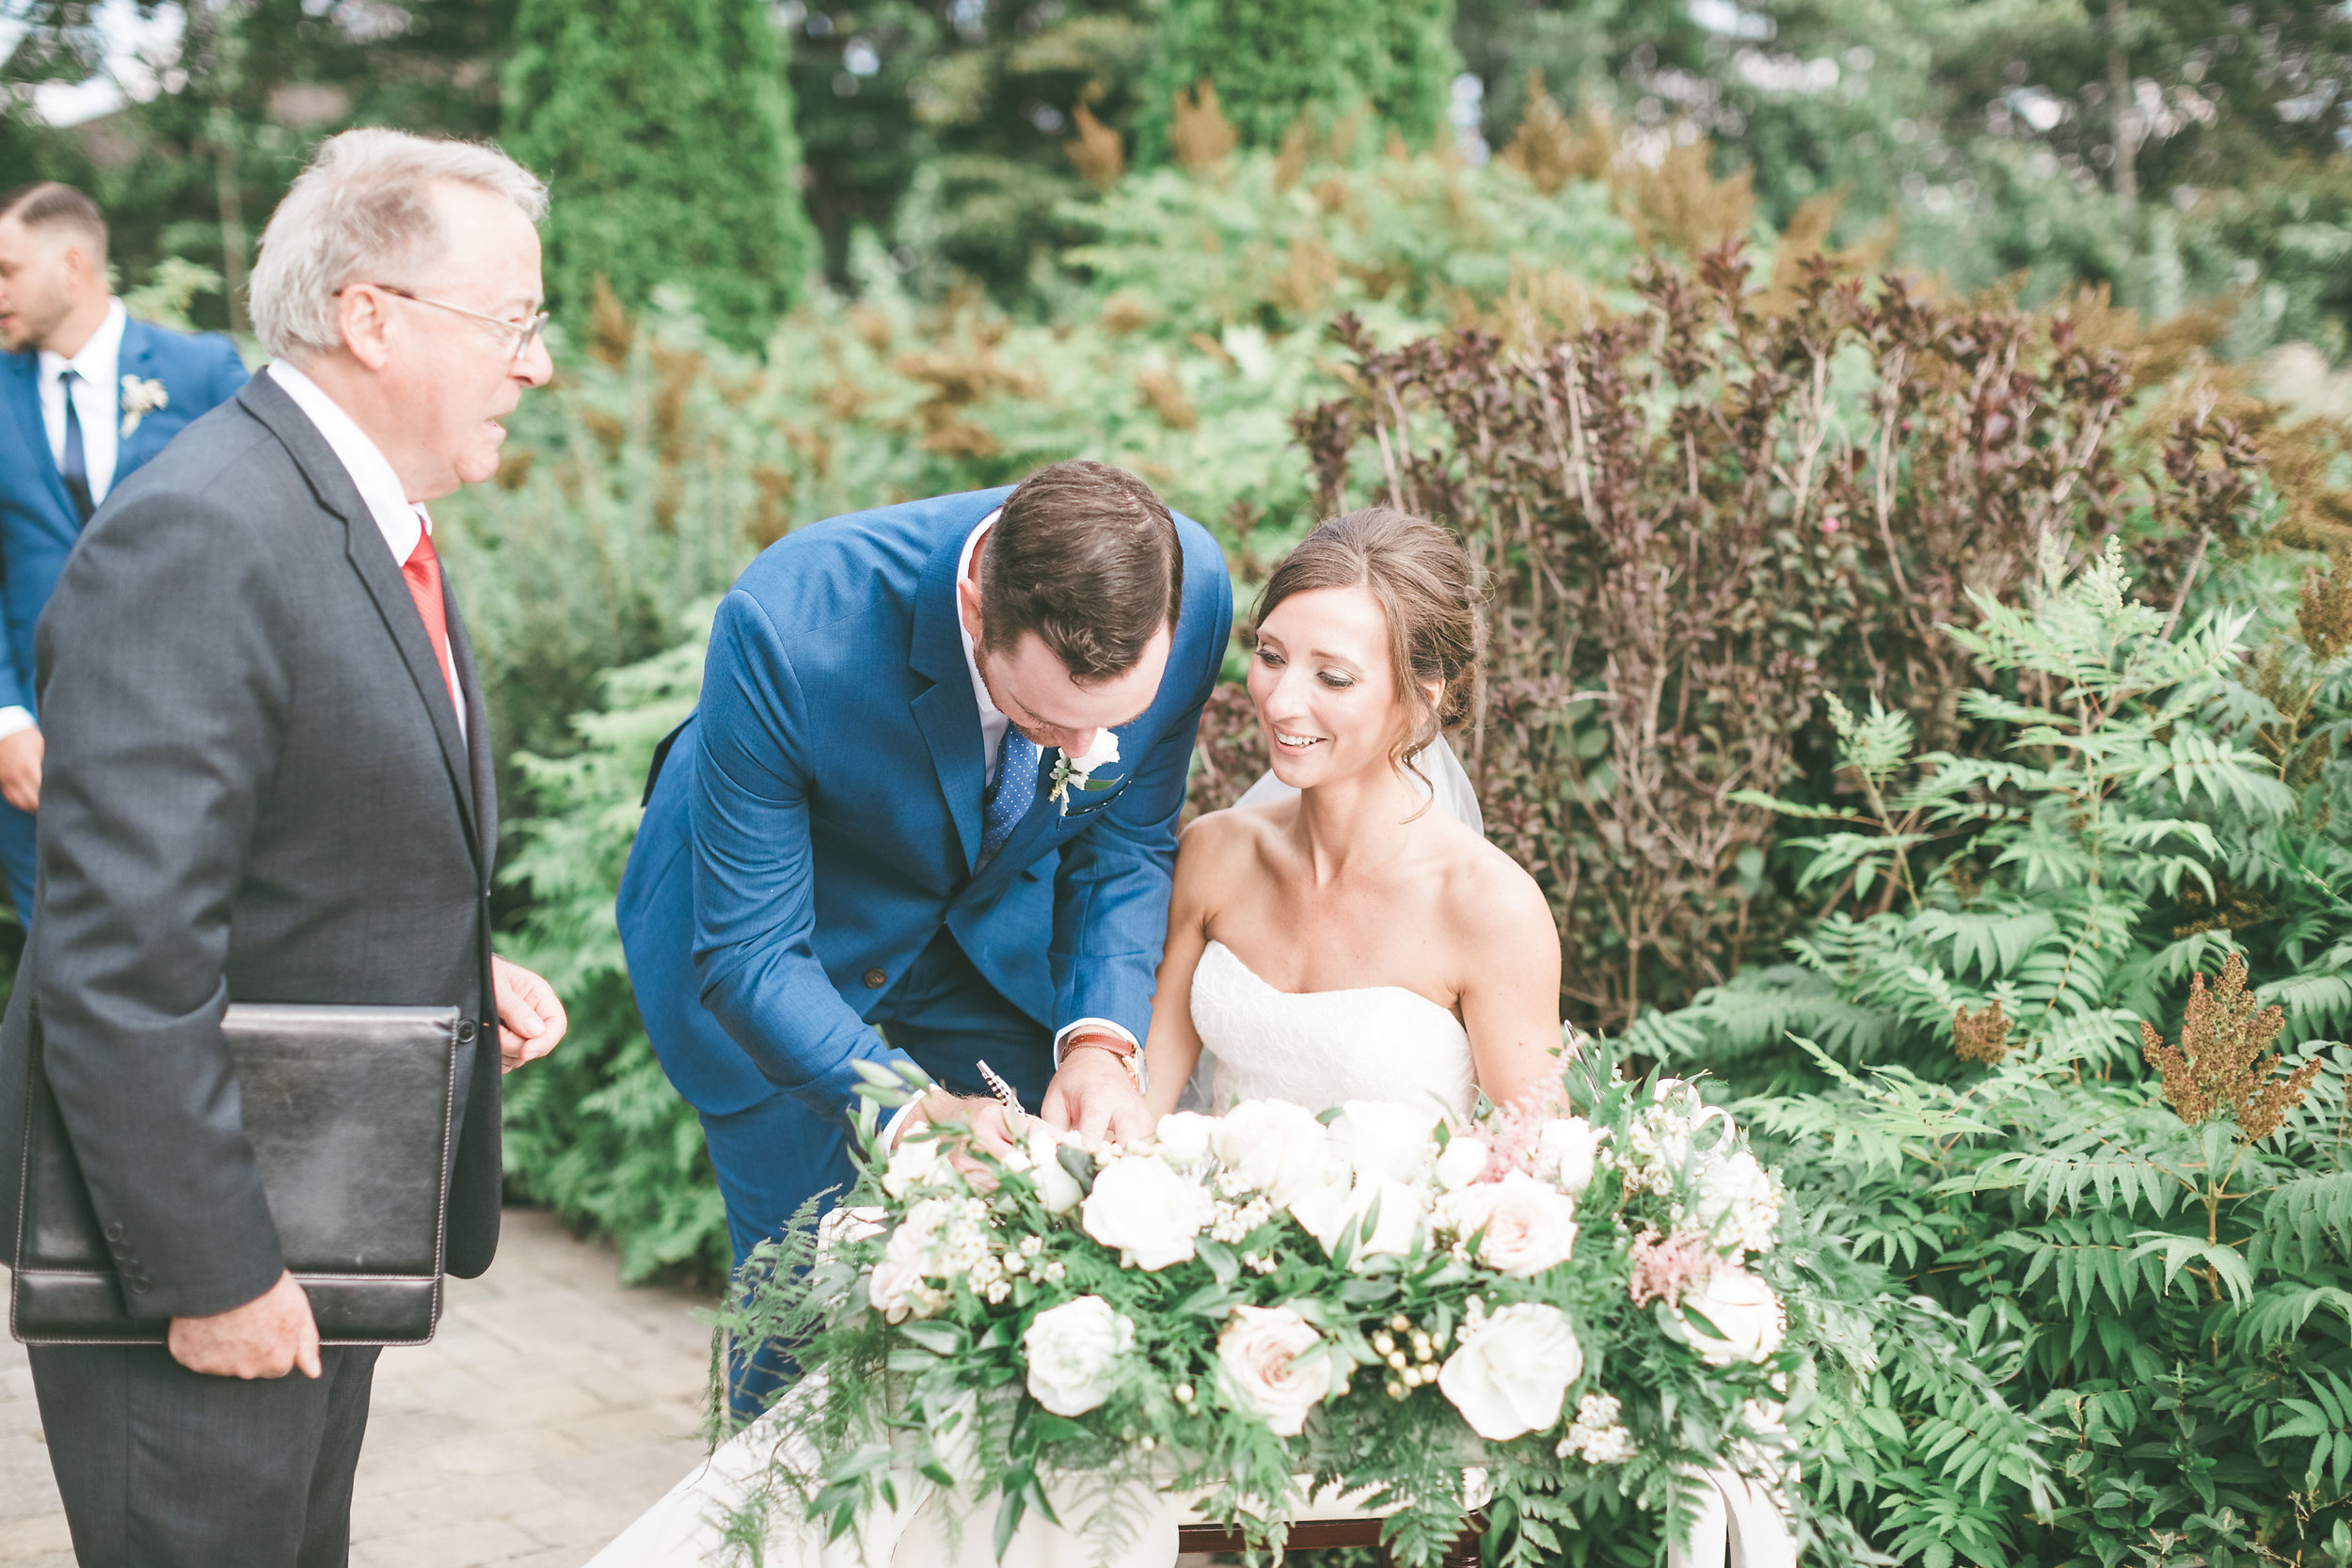 meaghan___darryl_wedding___danielcarusophotography___0852.jpg